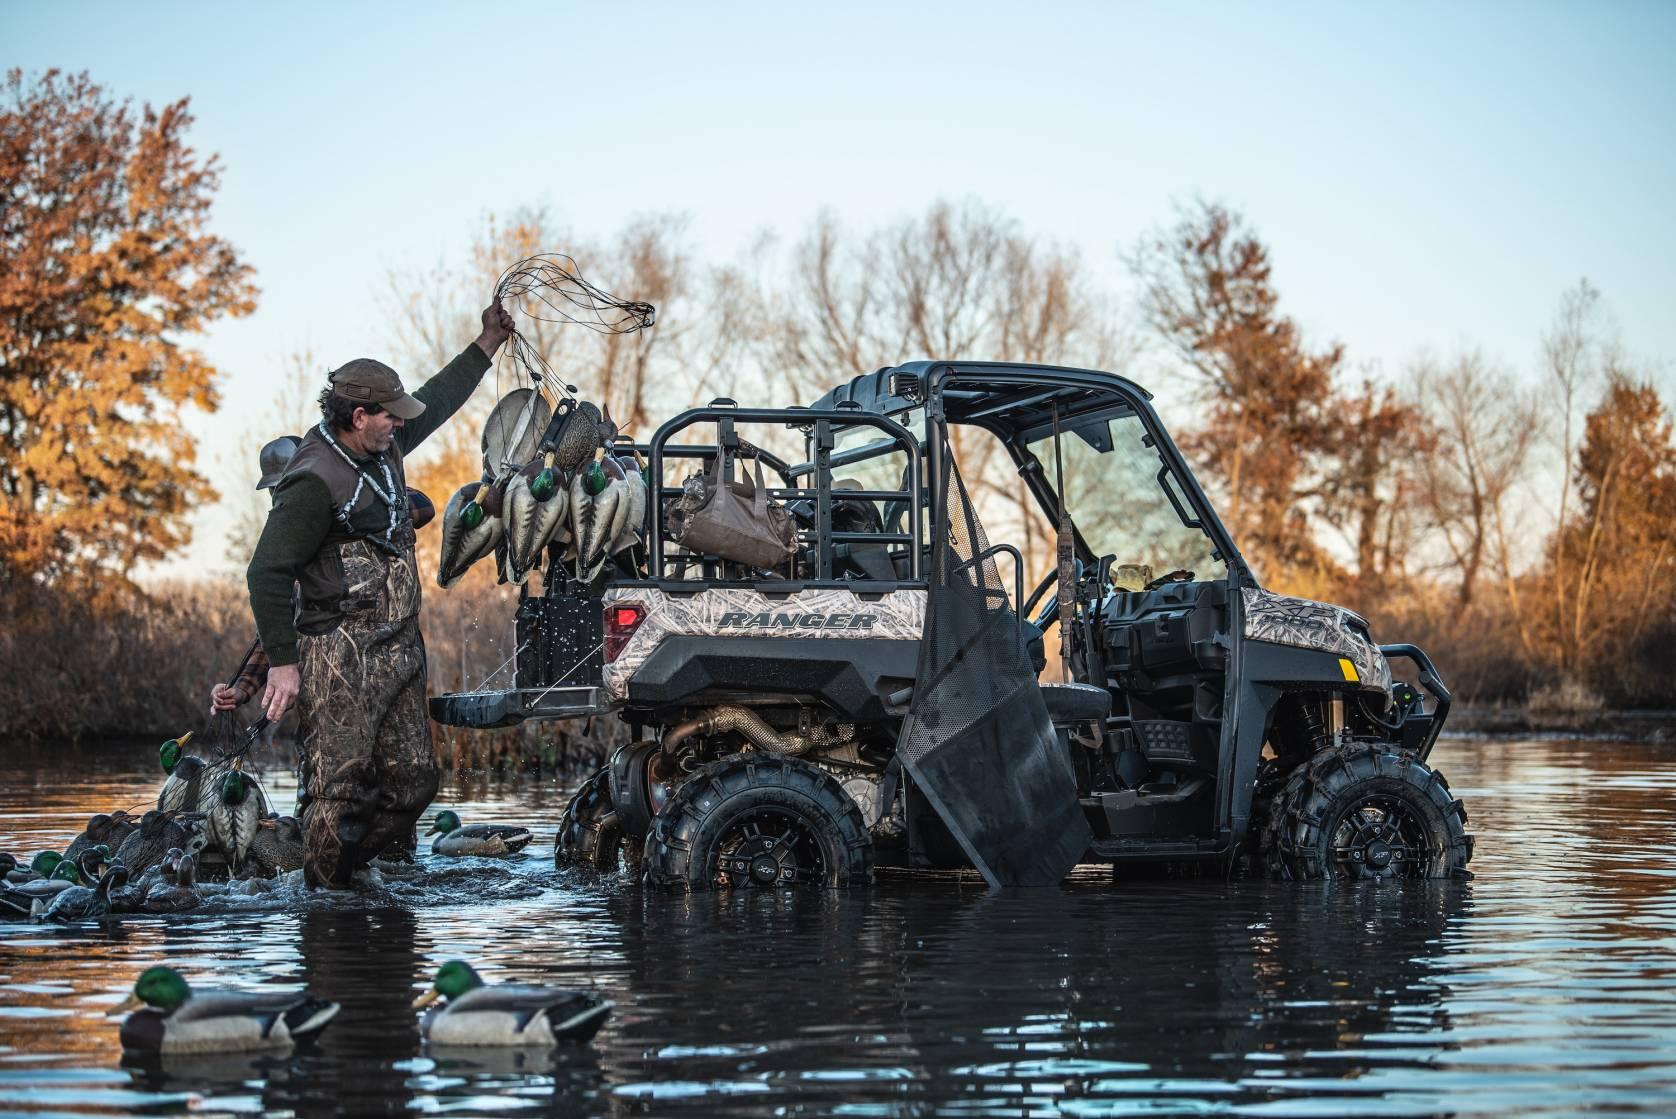 2021 Polaris Ranger Built for Waterfowl Hunting